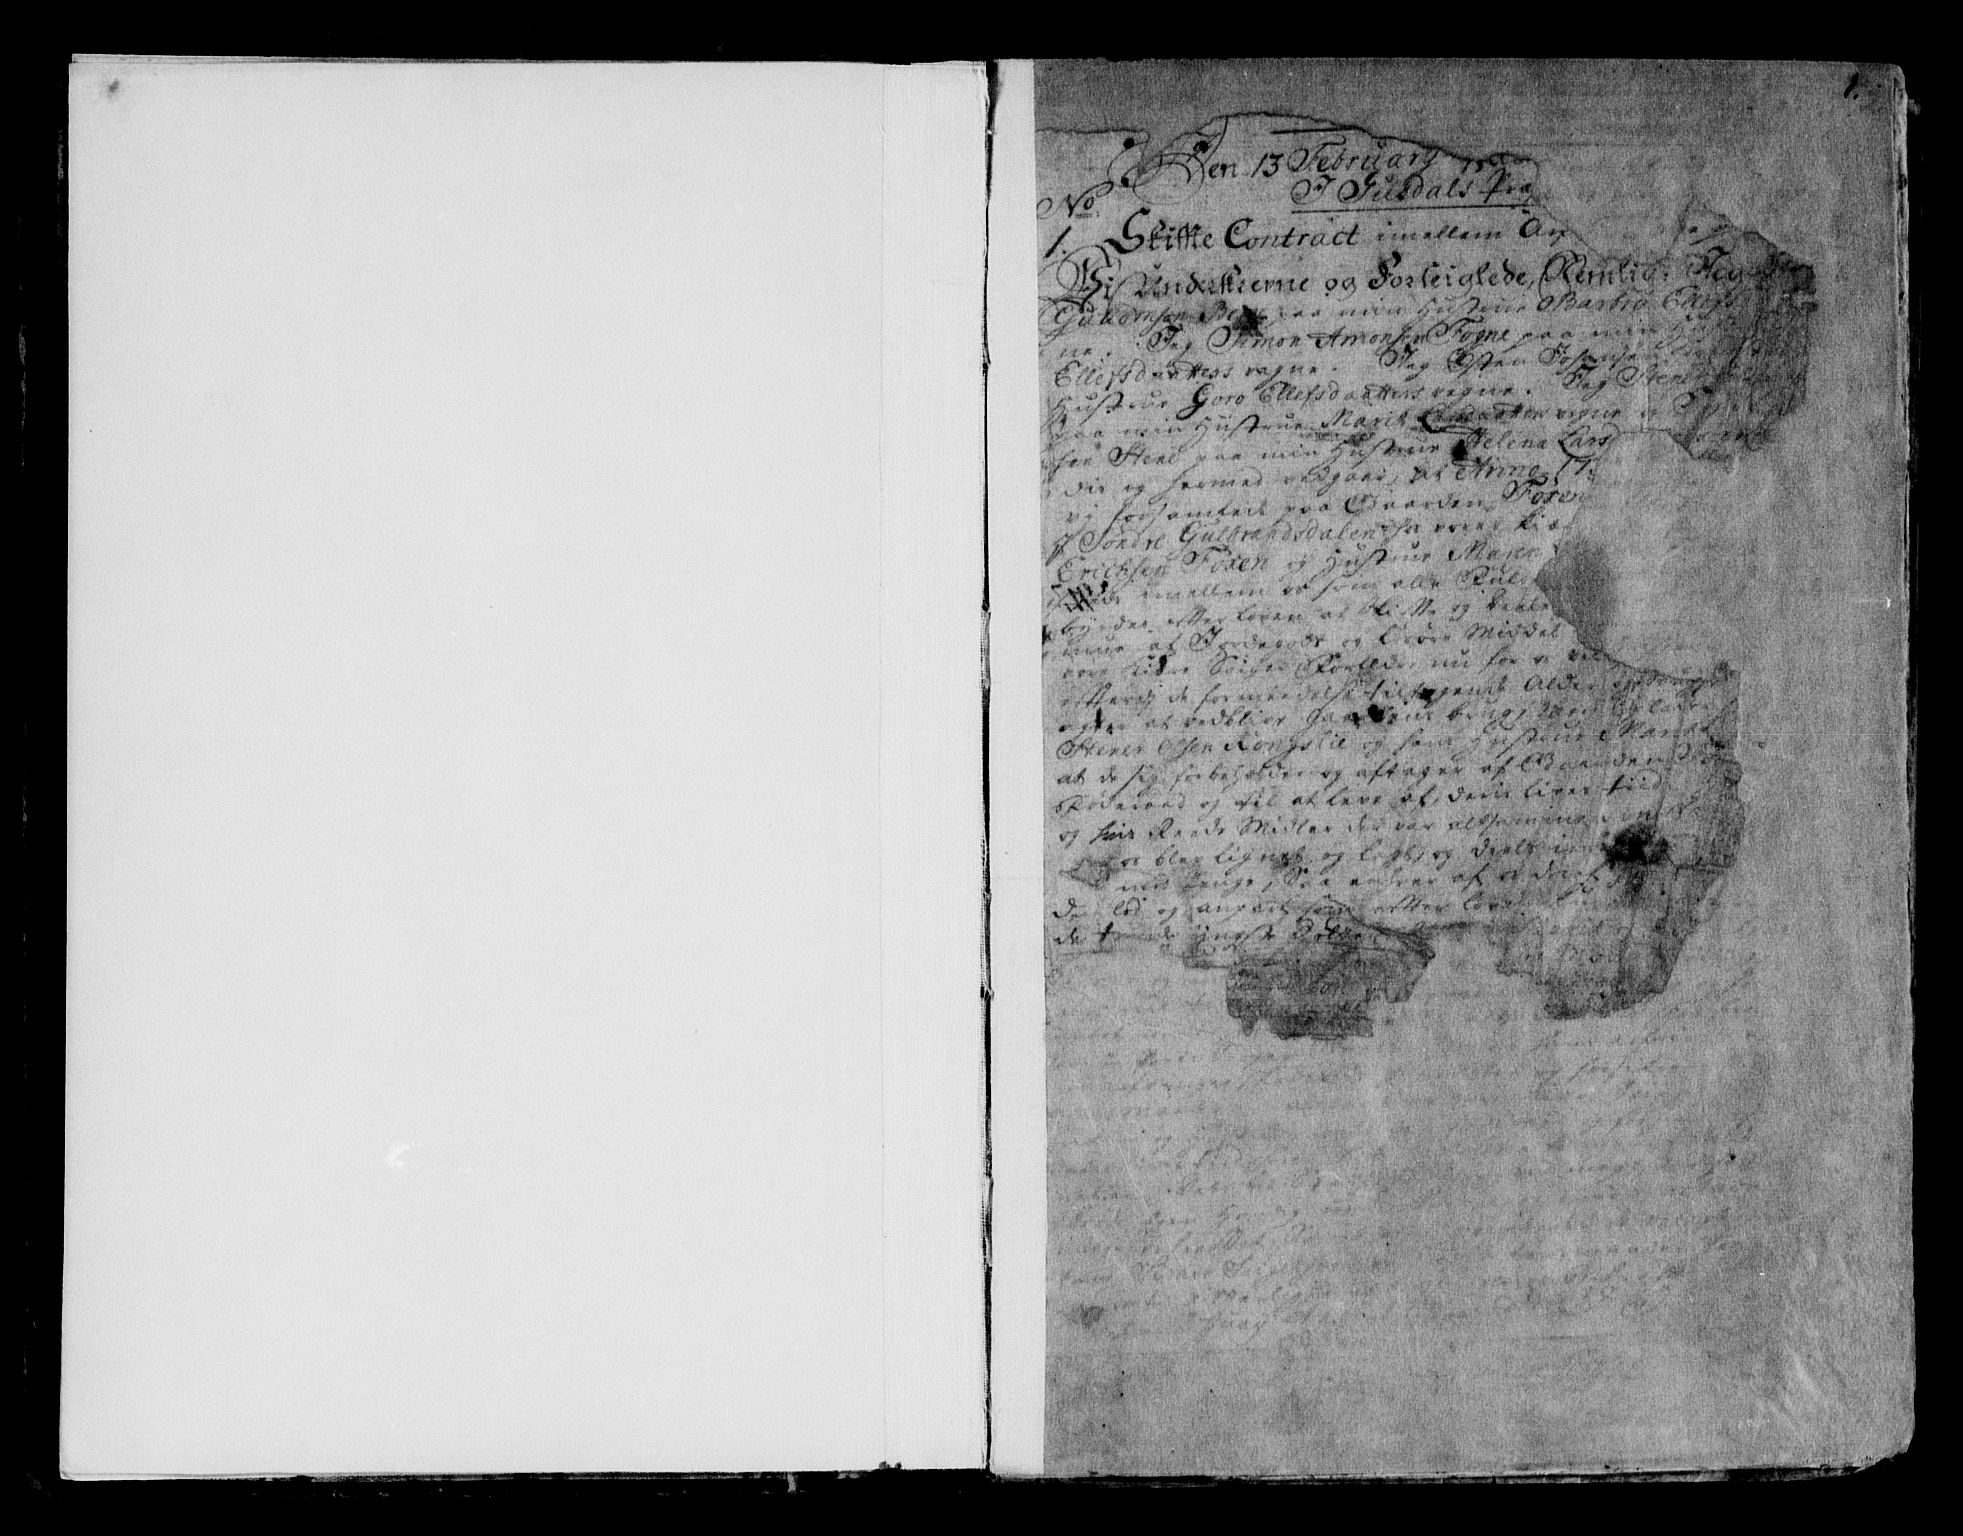 SAH, Sør-Gudbrandsdal sorenskriveri, H/Hb/Hba/L0002: Pantebok nr. I 2, 1738-1788, s. 1